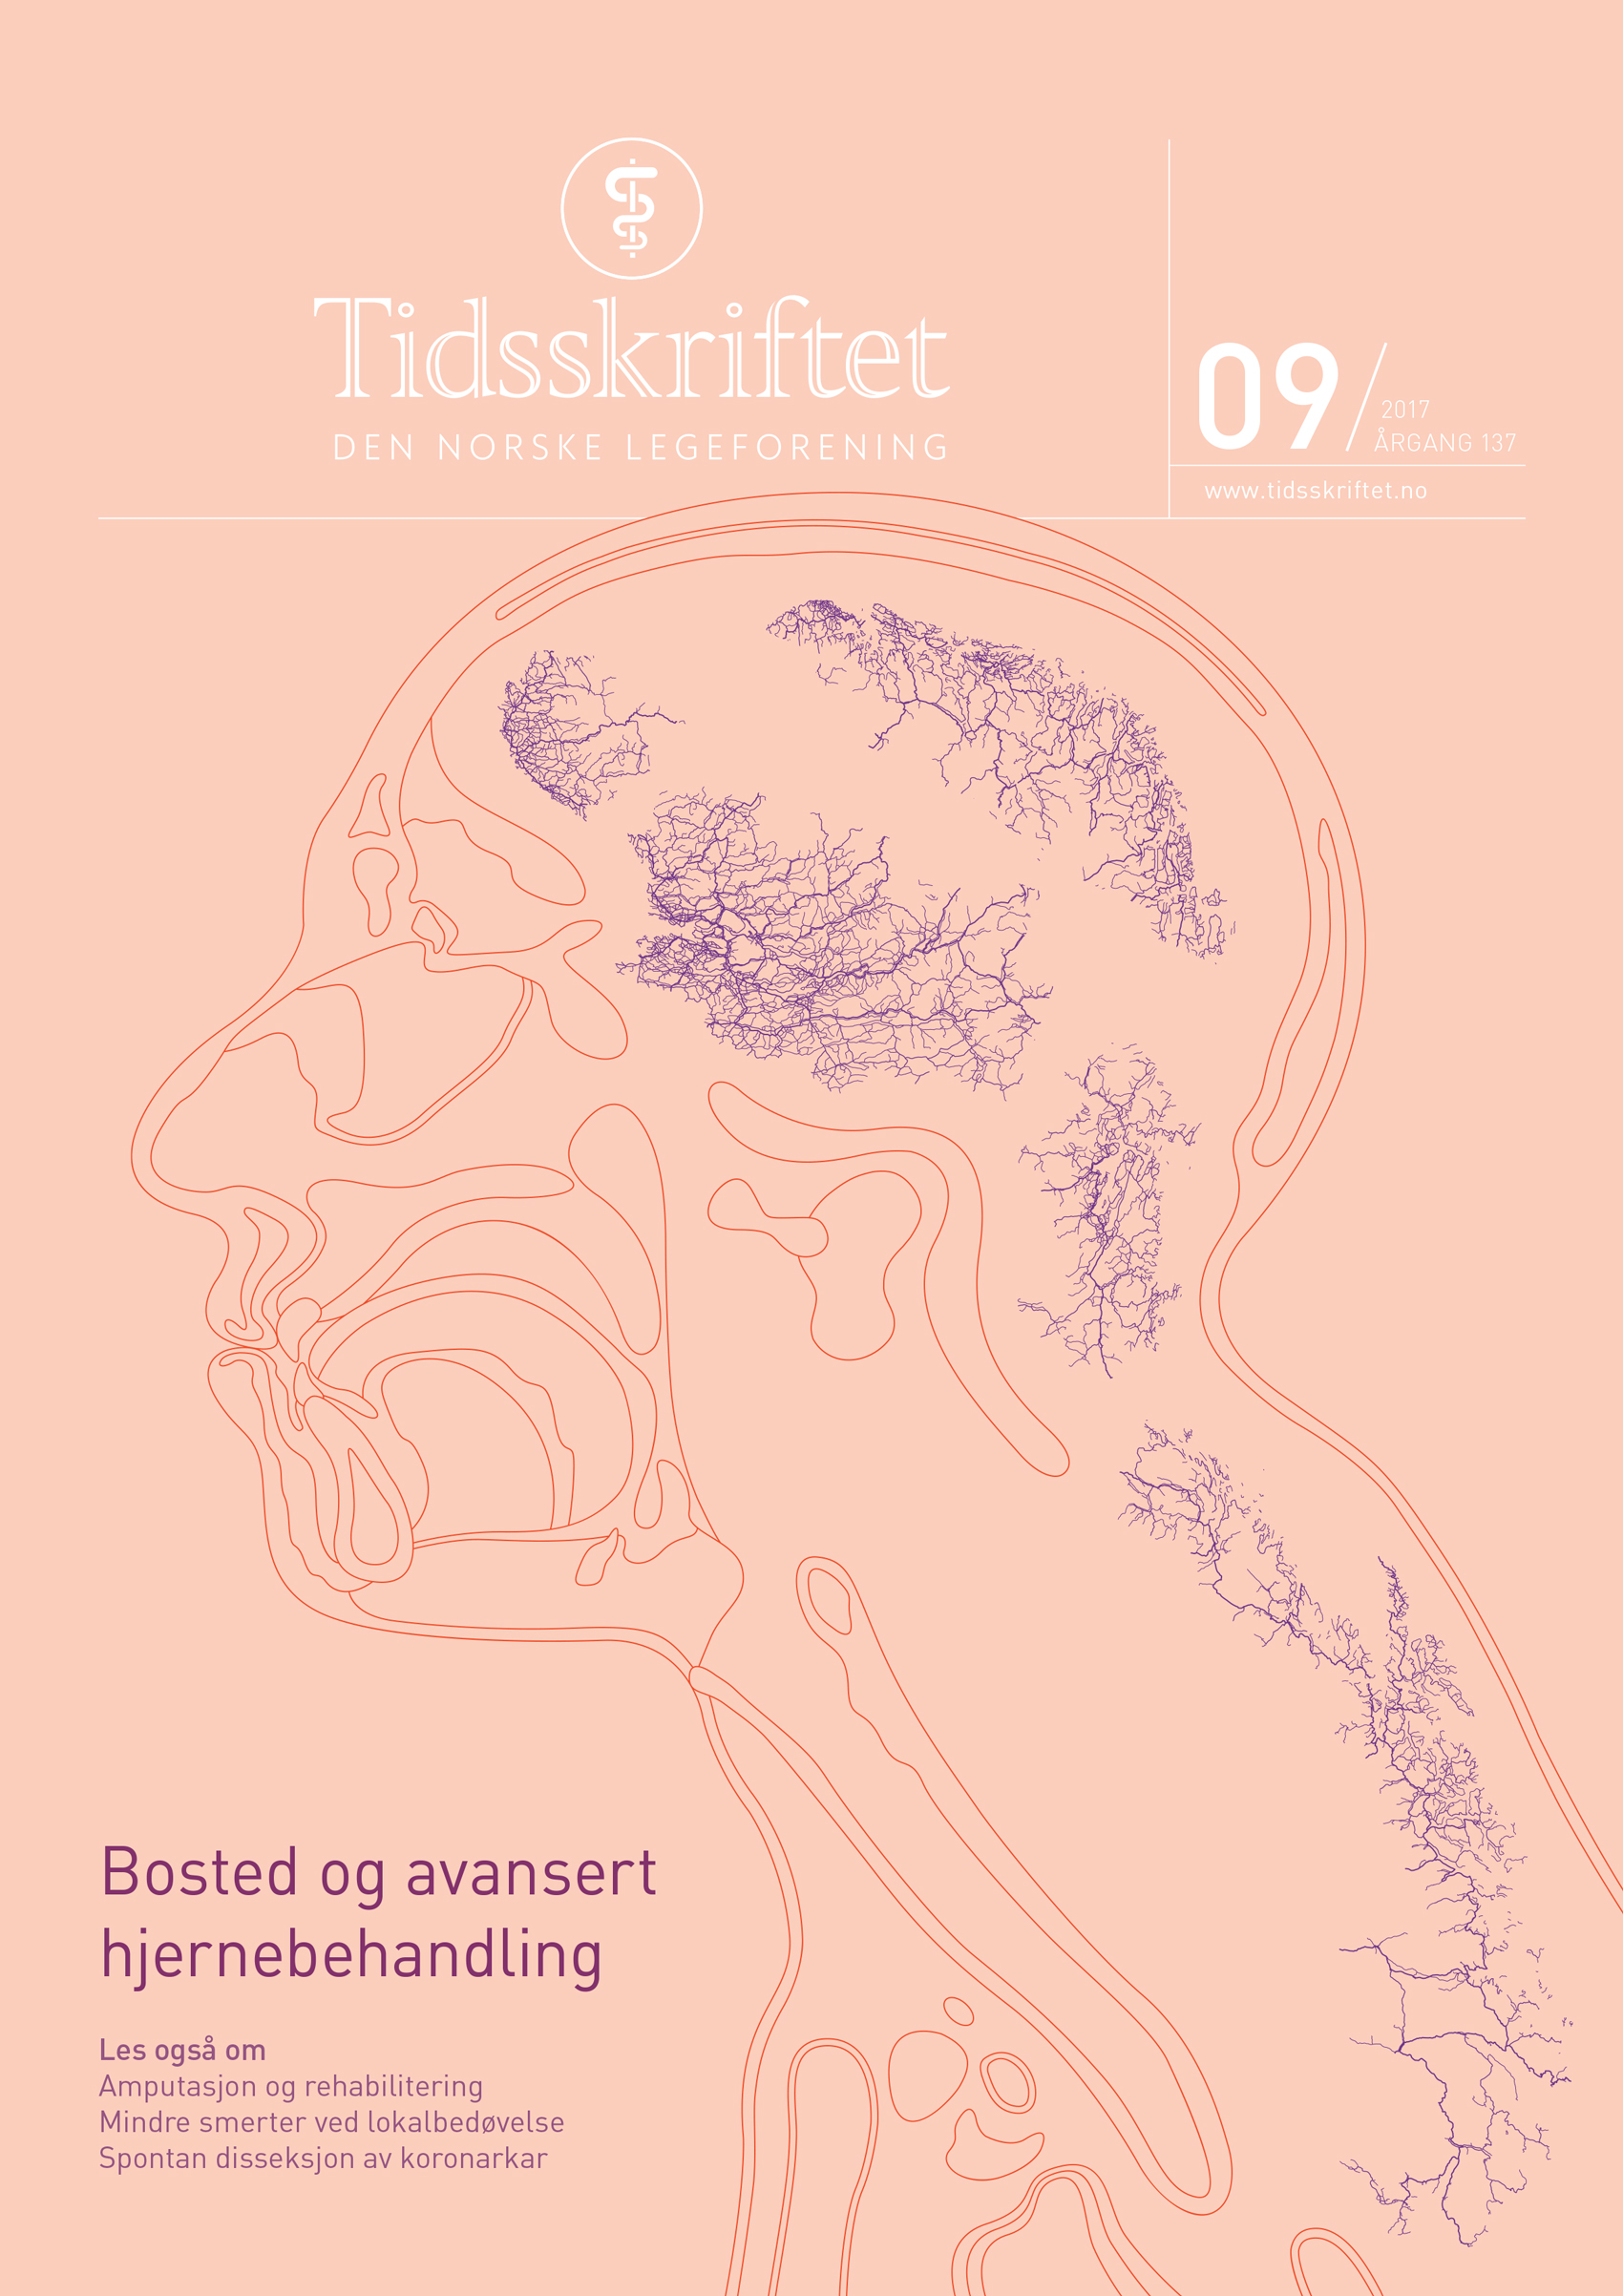 Layout/design by Lotte Grønneberg.